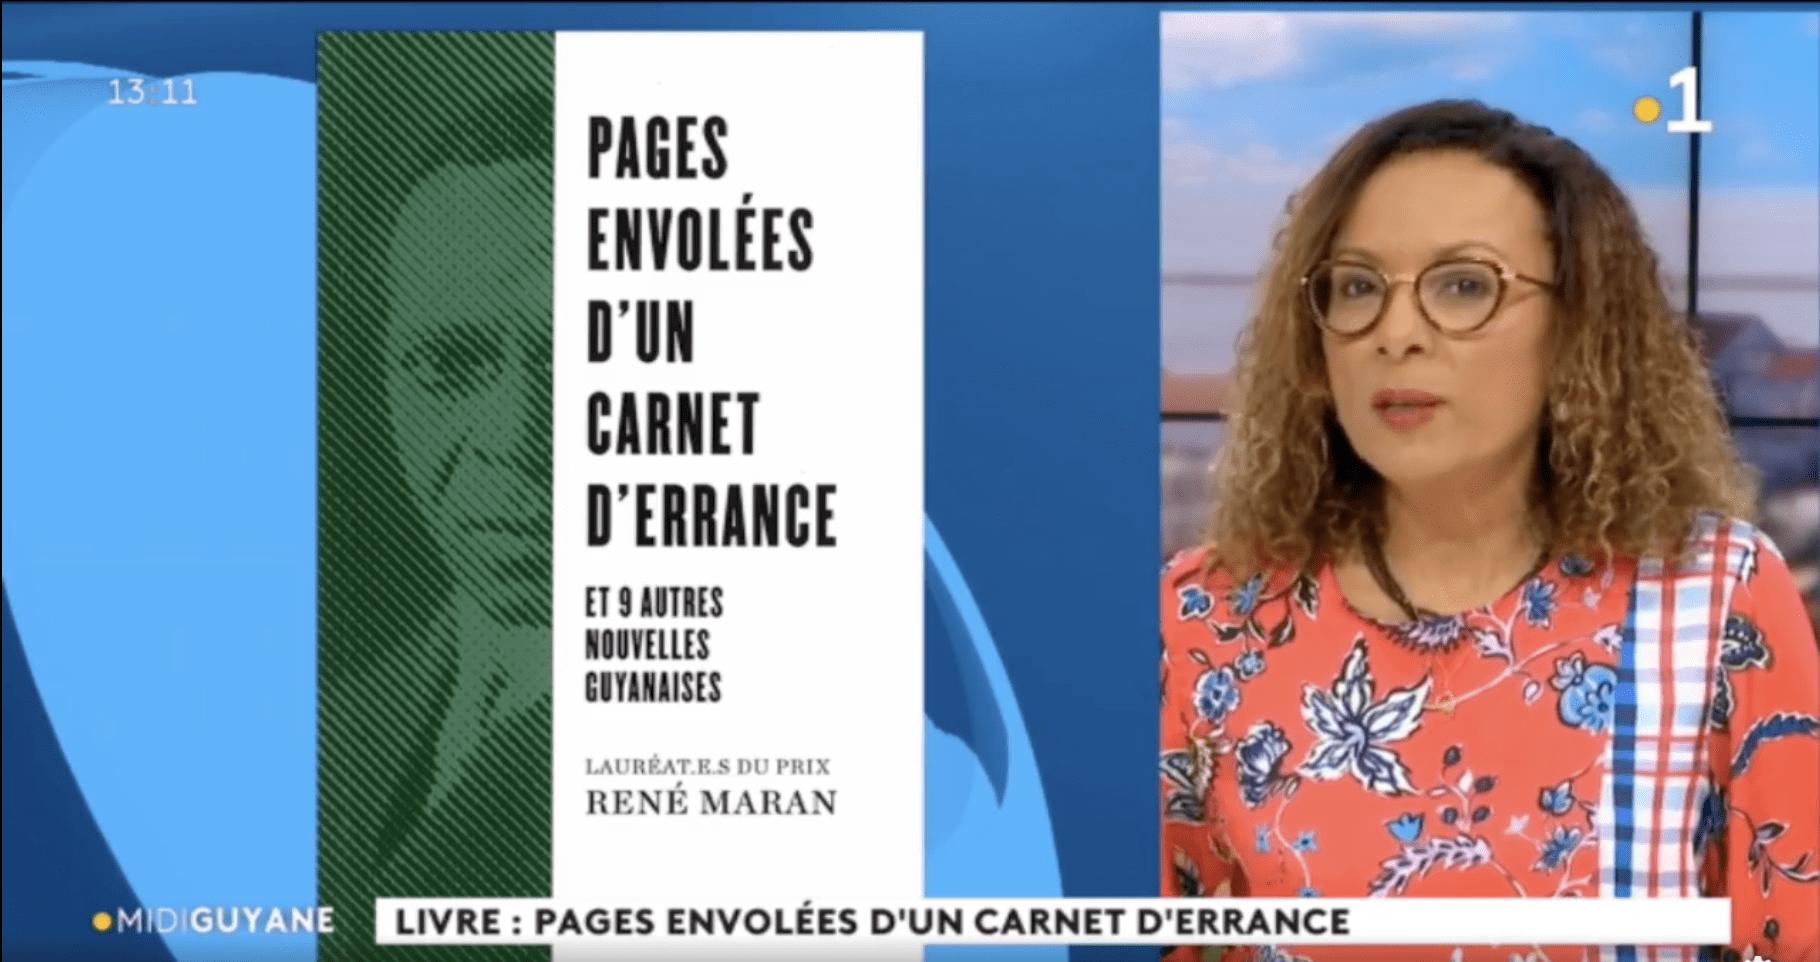 Capture Décran 2020 12 07 À 09.37.43, René Maran